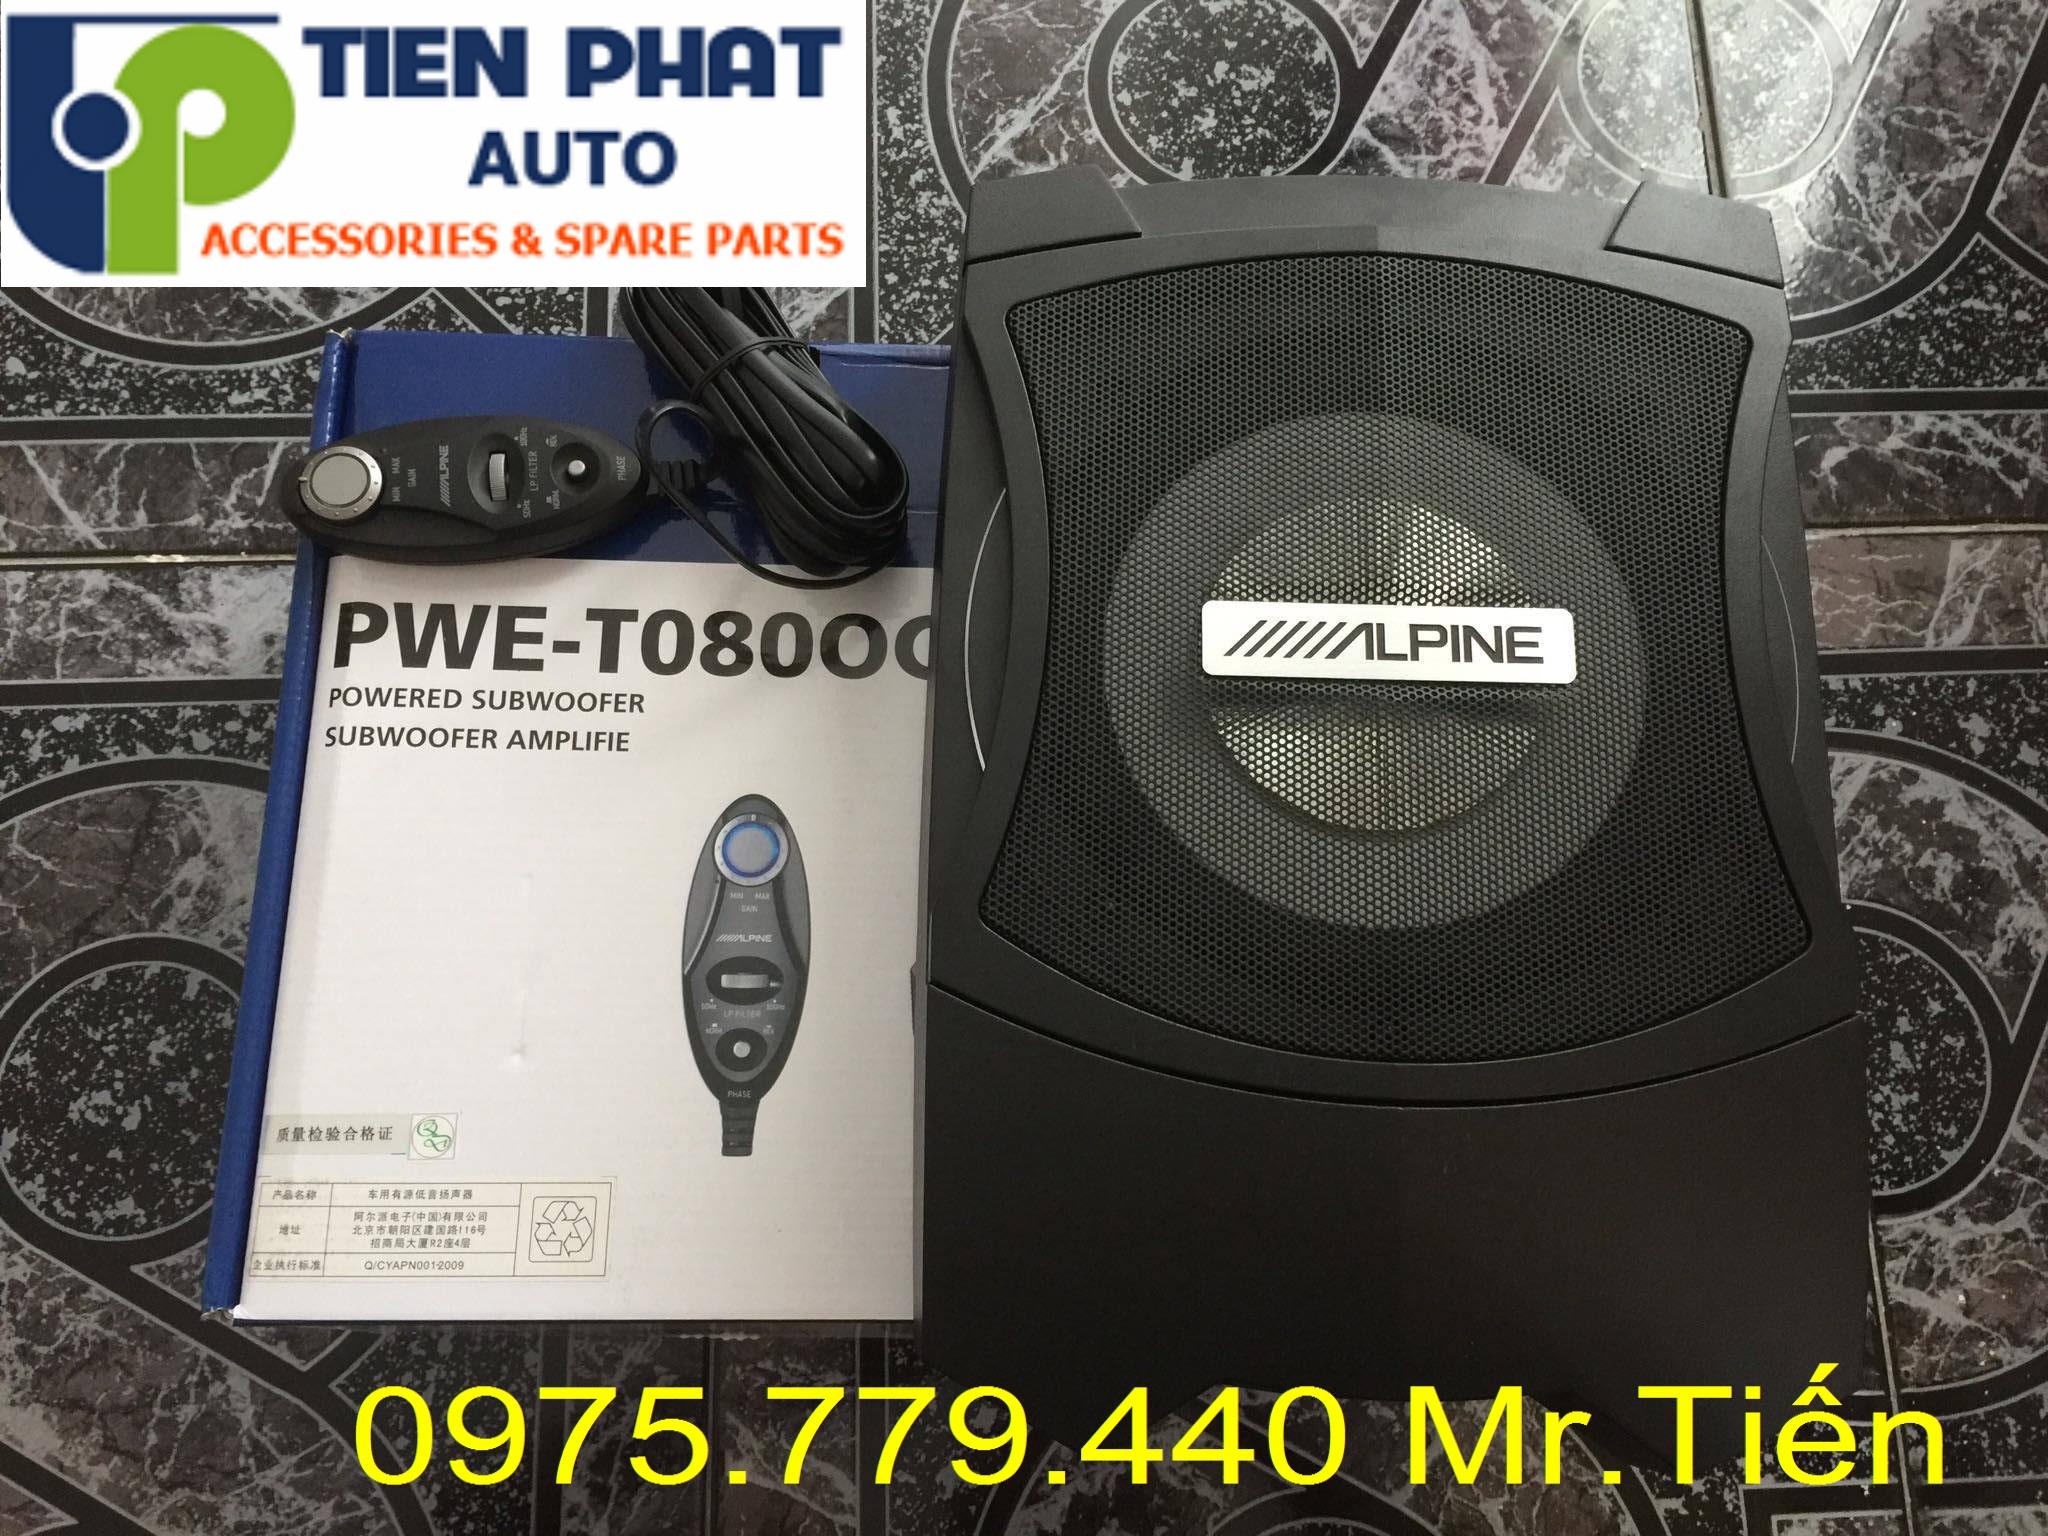 Lắp Loa sub Alpine PWE-T0800C cho Kia Canival Lắp Đặt Tận Nơi